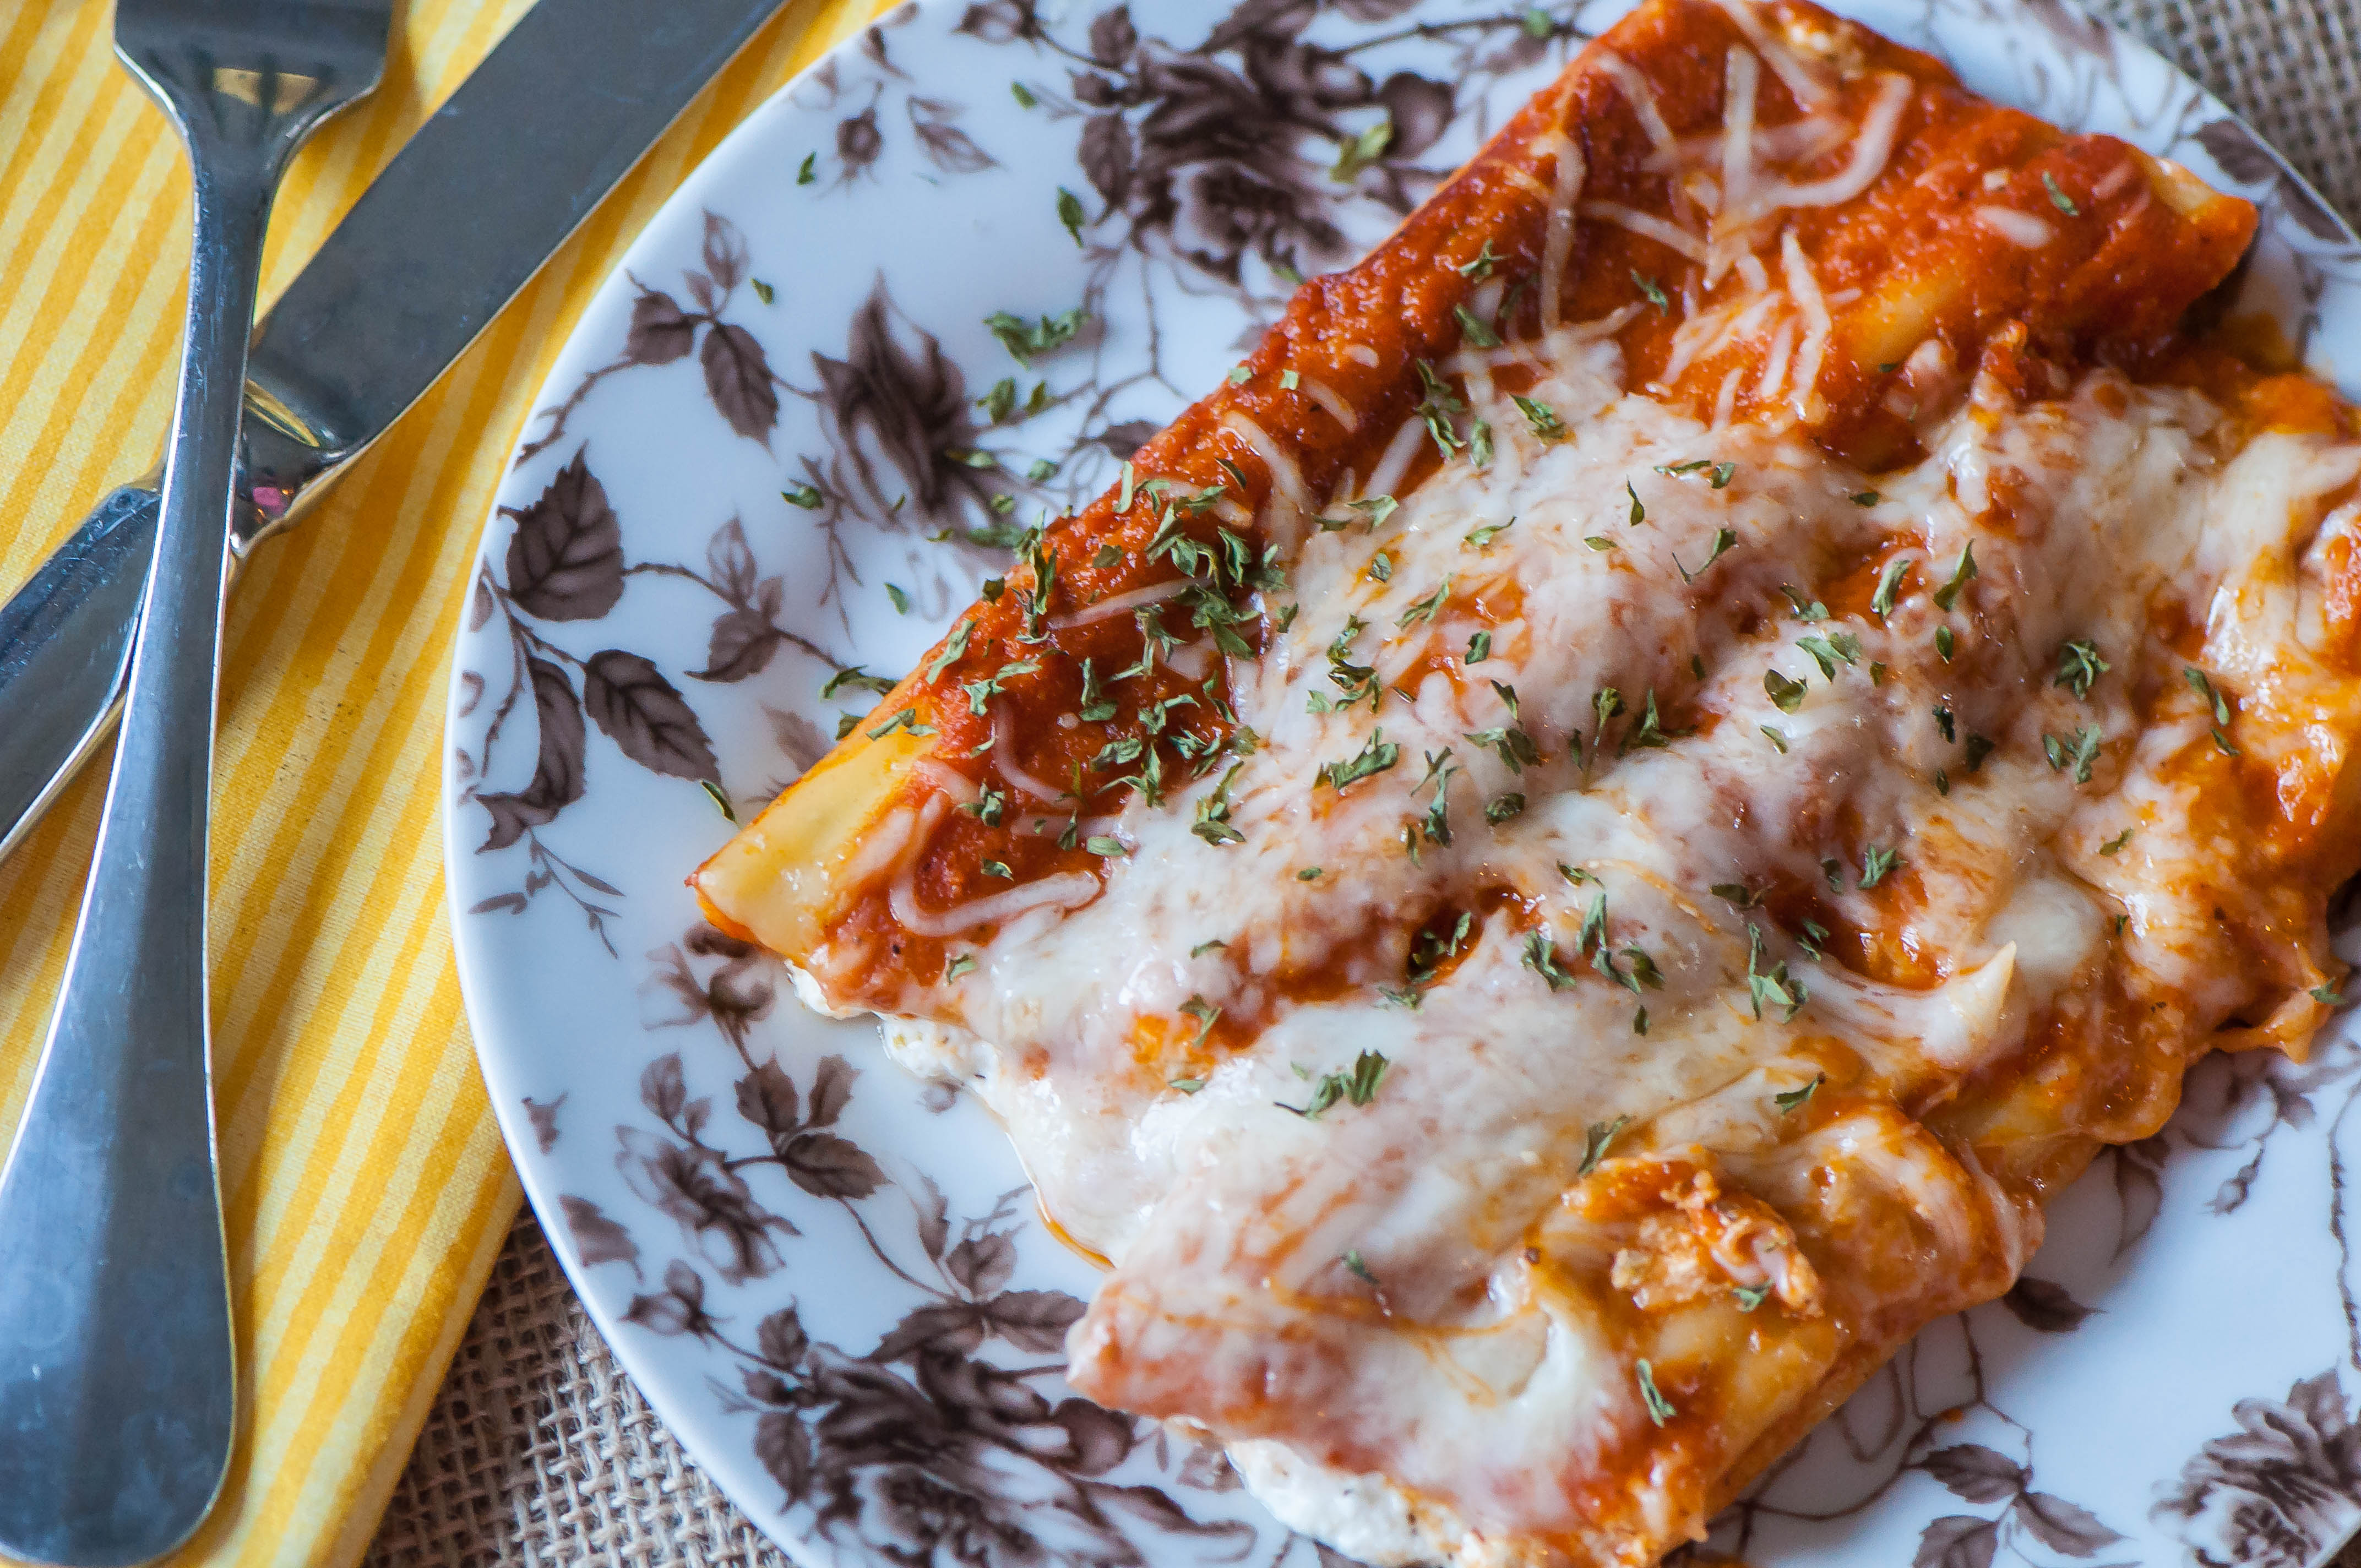 Pizza Manicotti